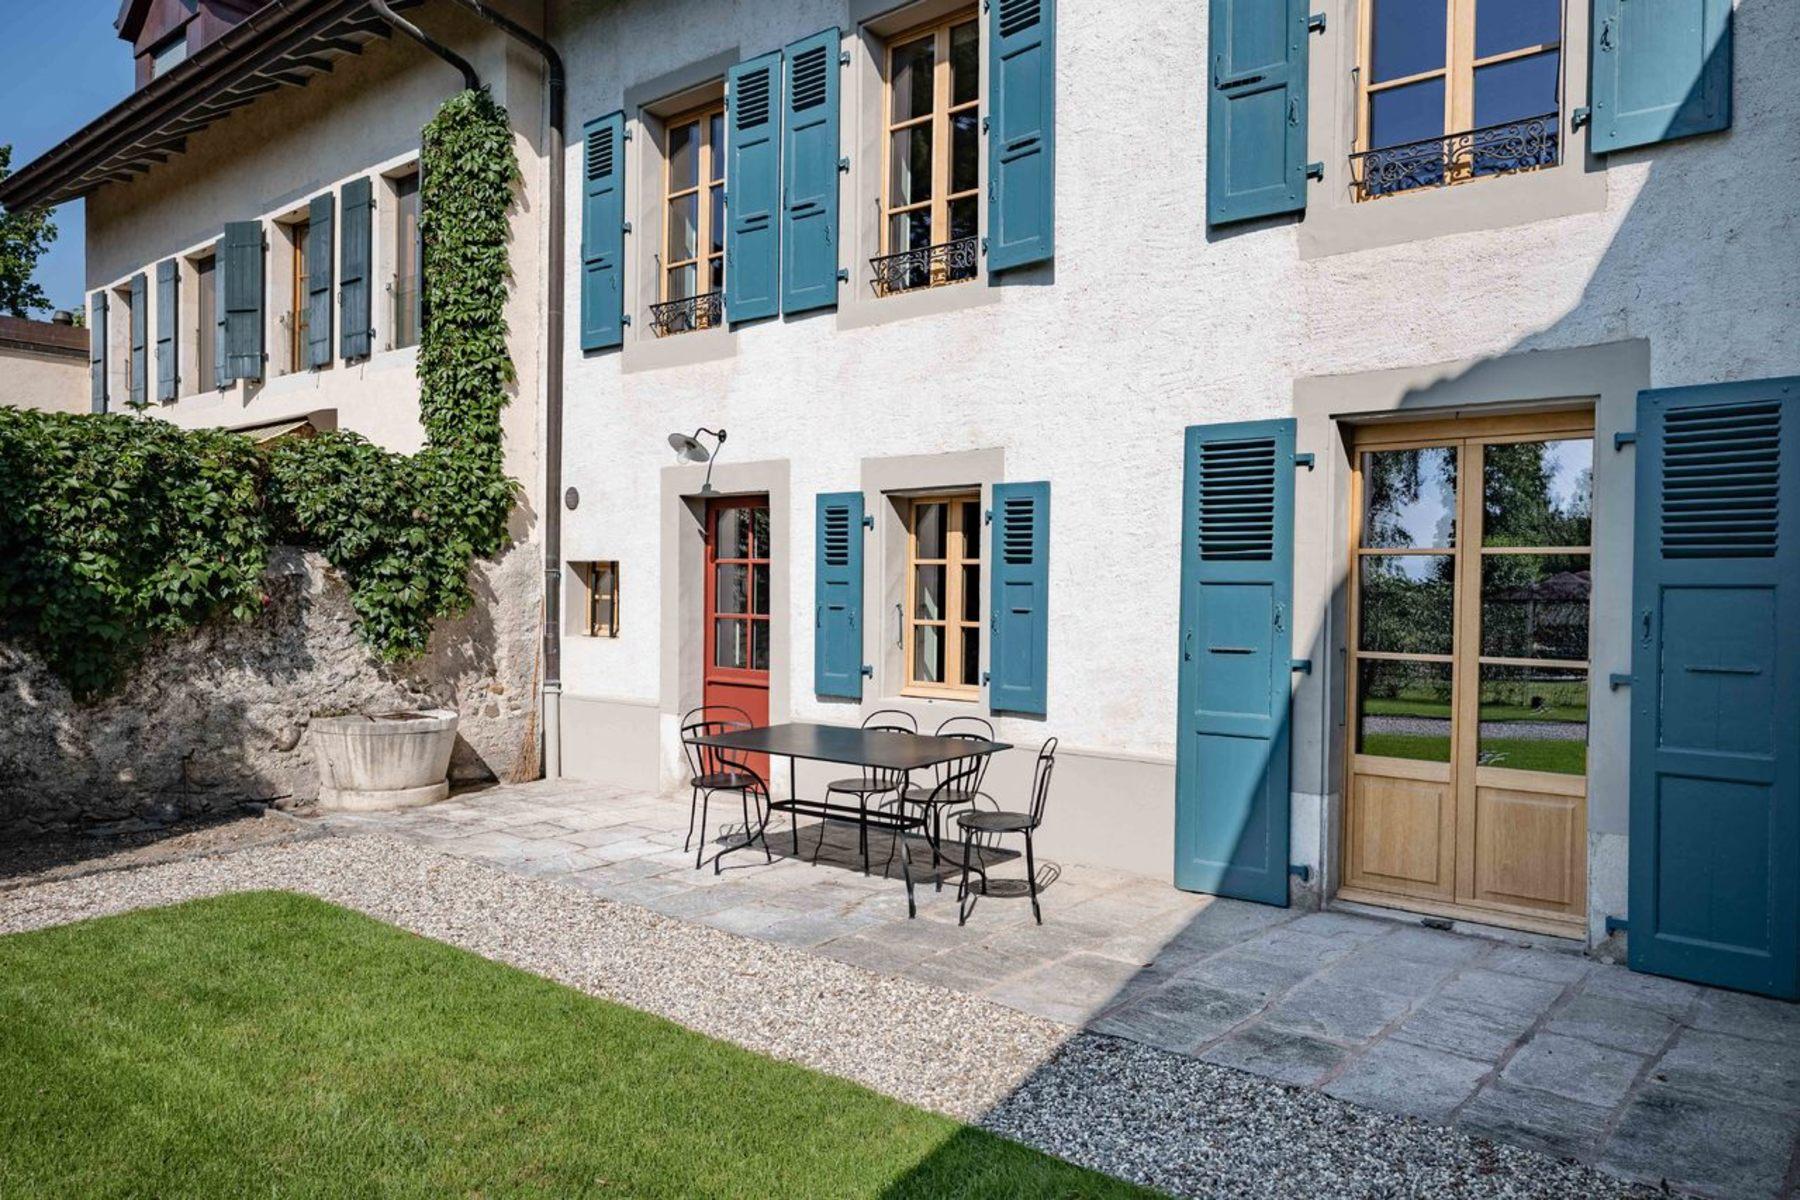 Single Family Homes のために 売買 アット The charm of a bright village house Mies Mies, ヴォー 1295 スイス